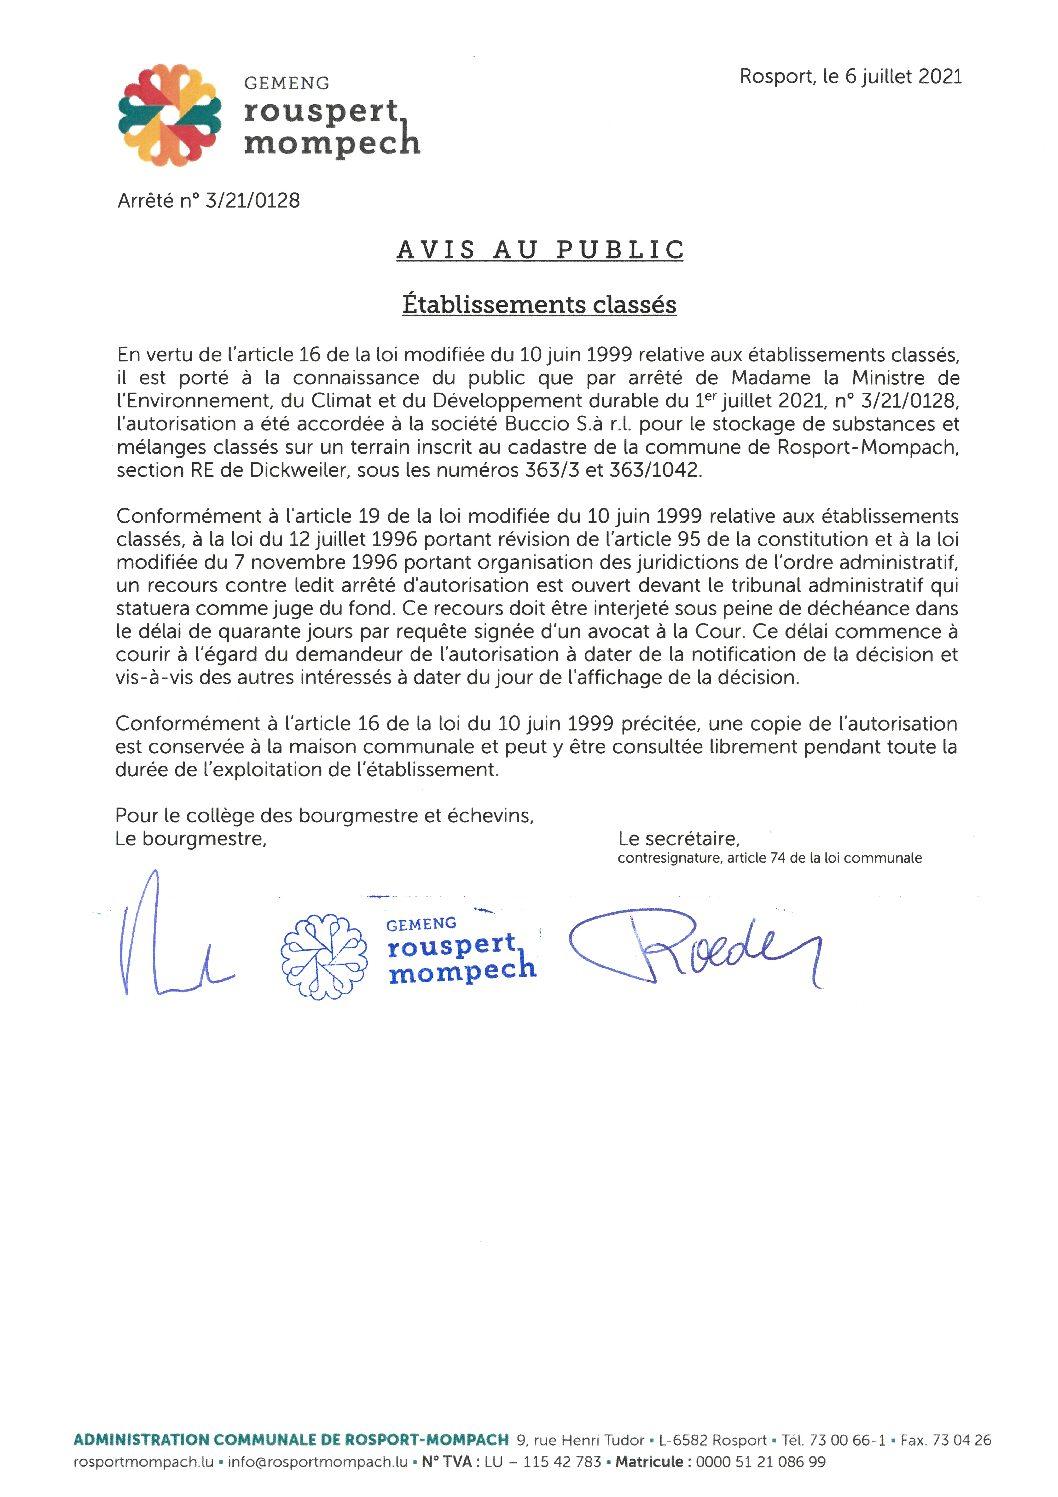 2021-07-06 - BACCIO - autorisation environnement